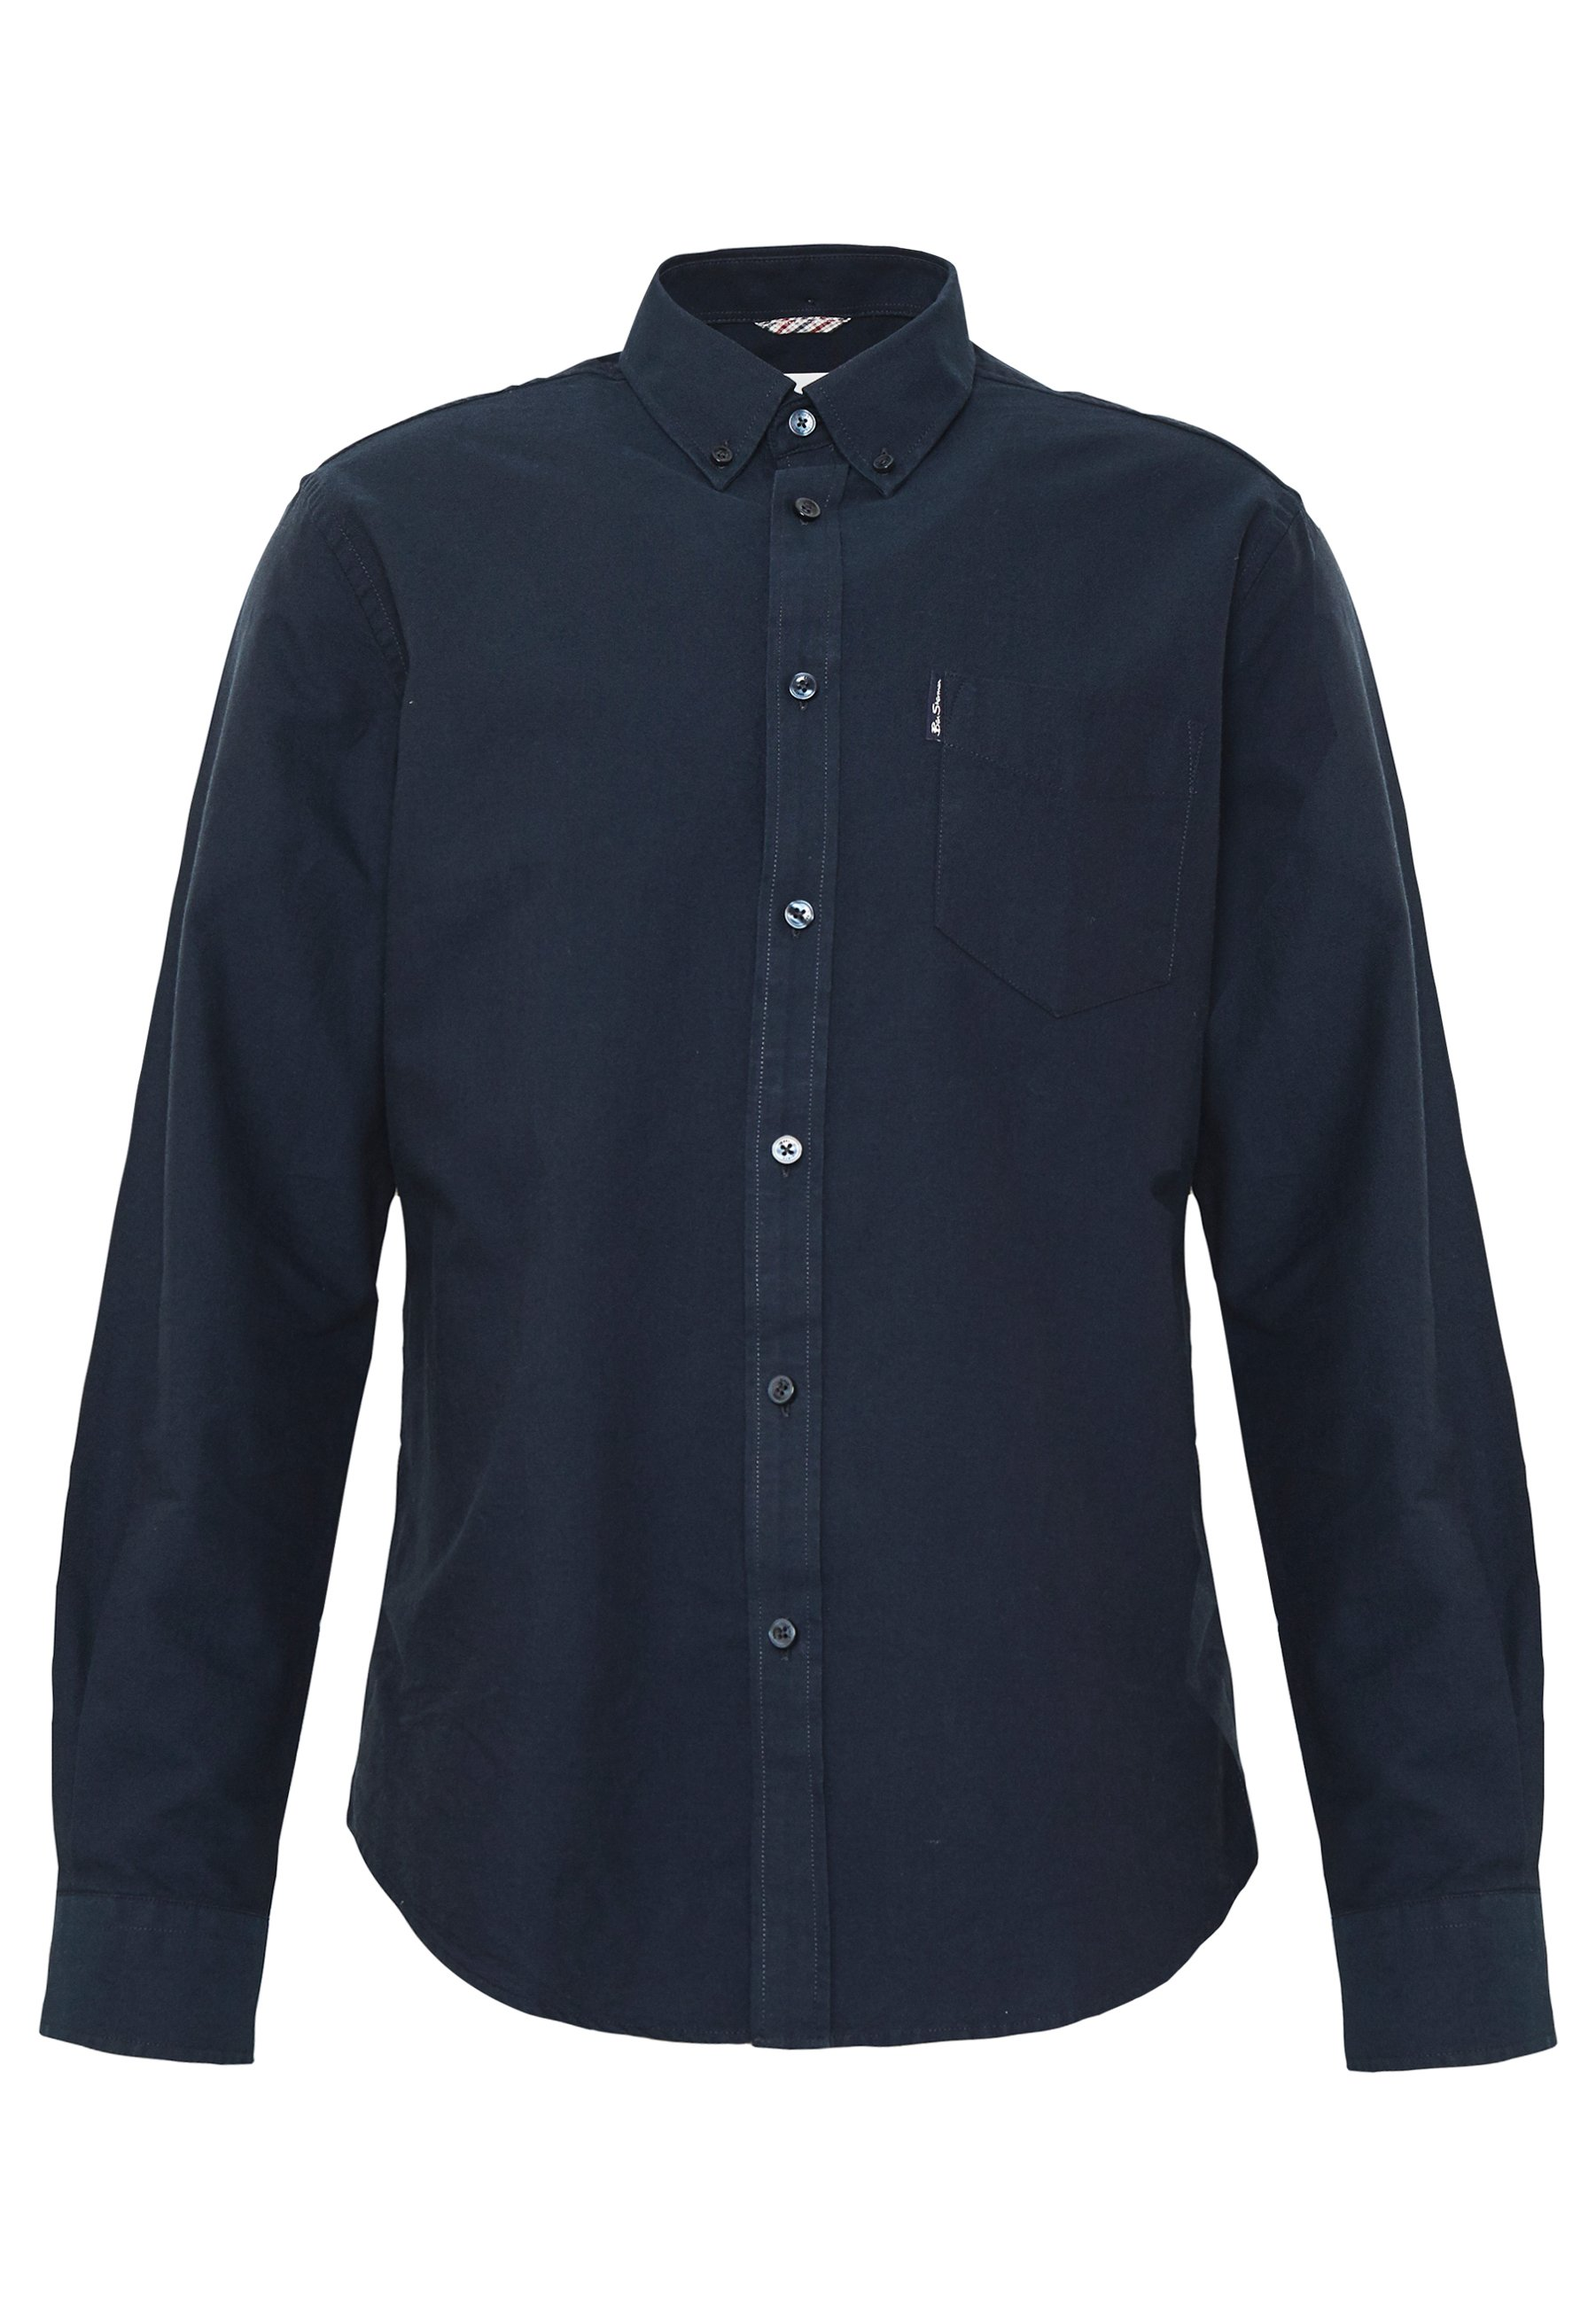 Ben Sherman Signature Oxford Shirt - Camicia Navy dg7w2iG